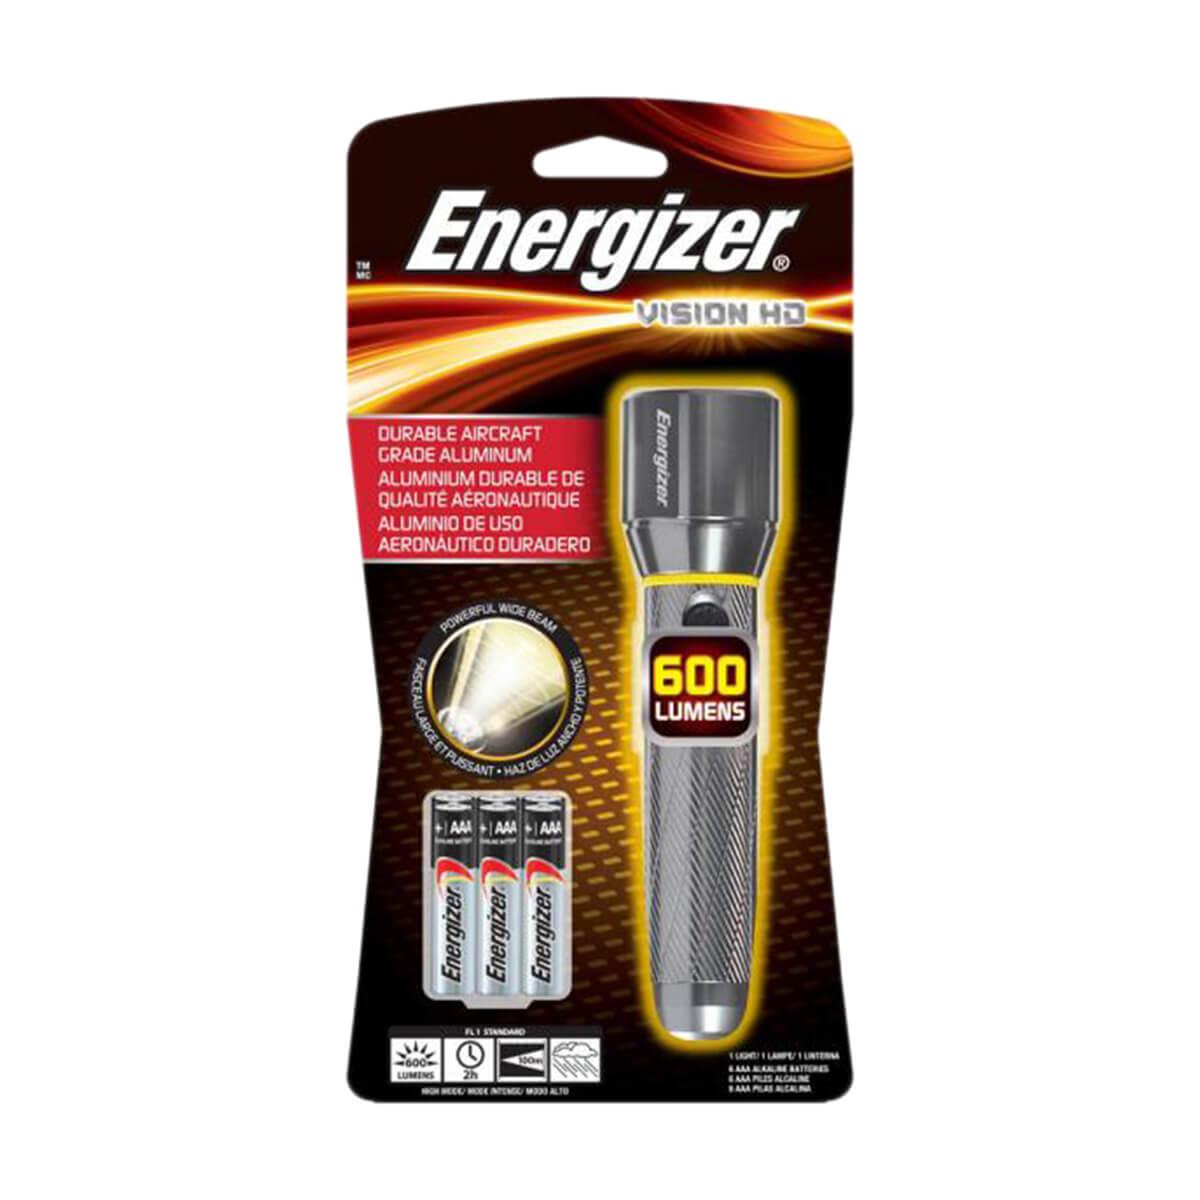 Flashlight - Energizer Vision HD - 600 lu